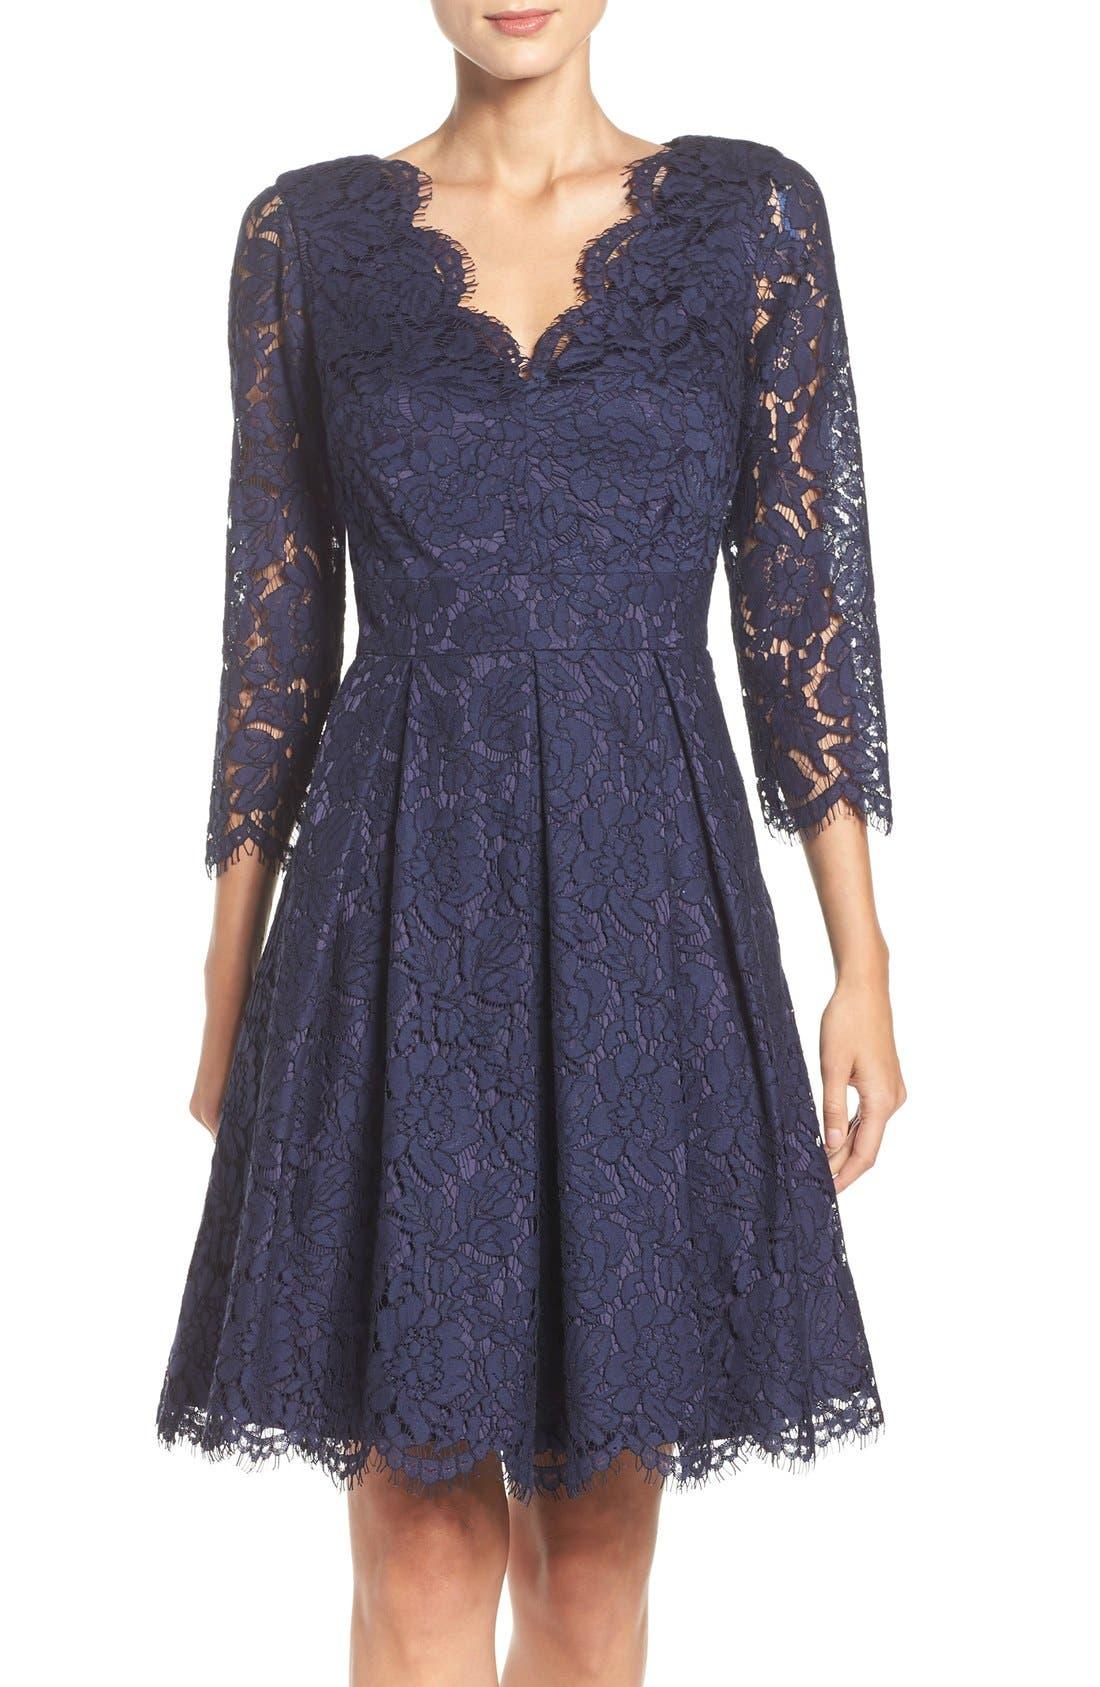 Alternate Image 1 Selected - Eliza J Lace Fit & Flare Dress